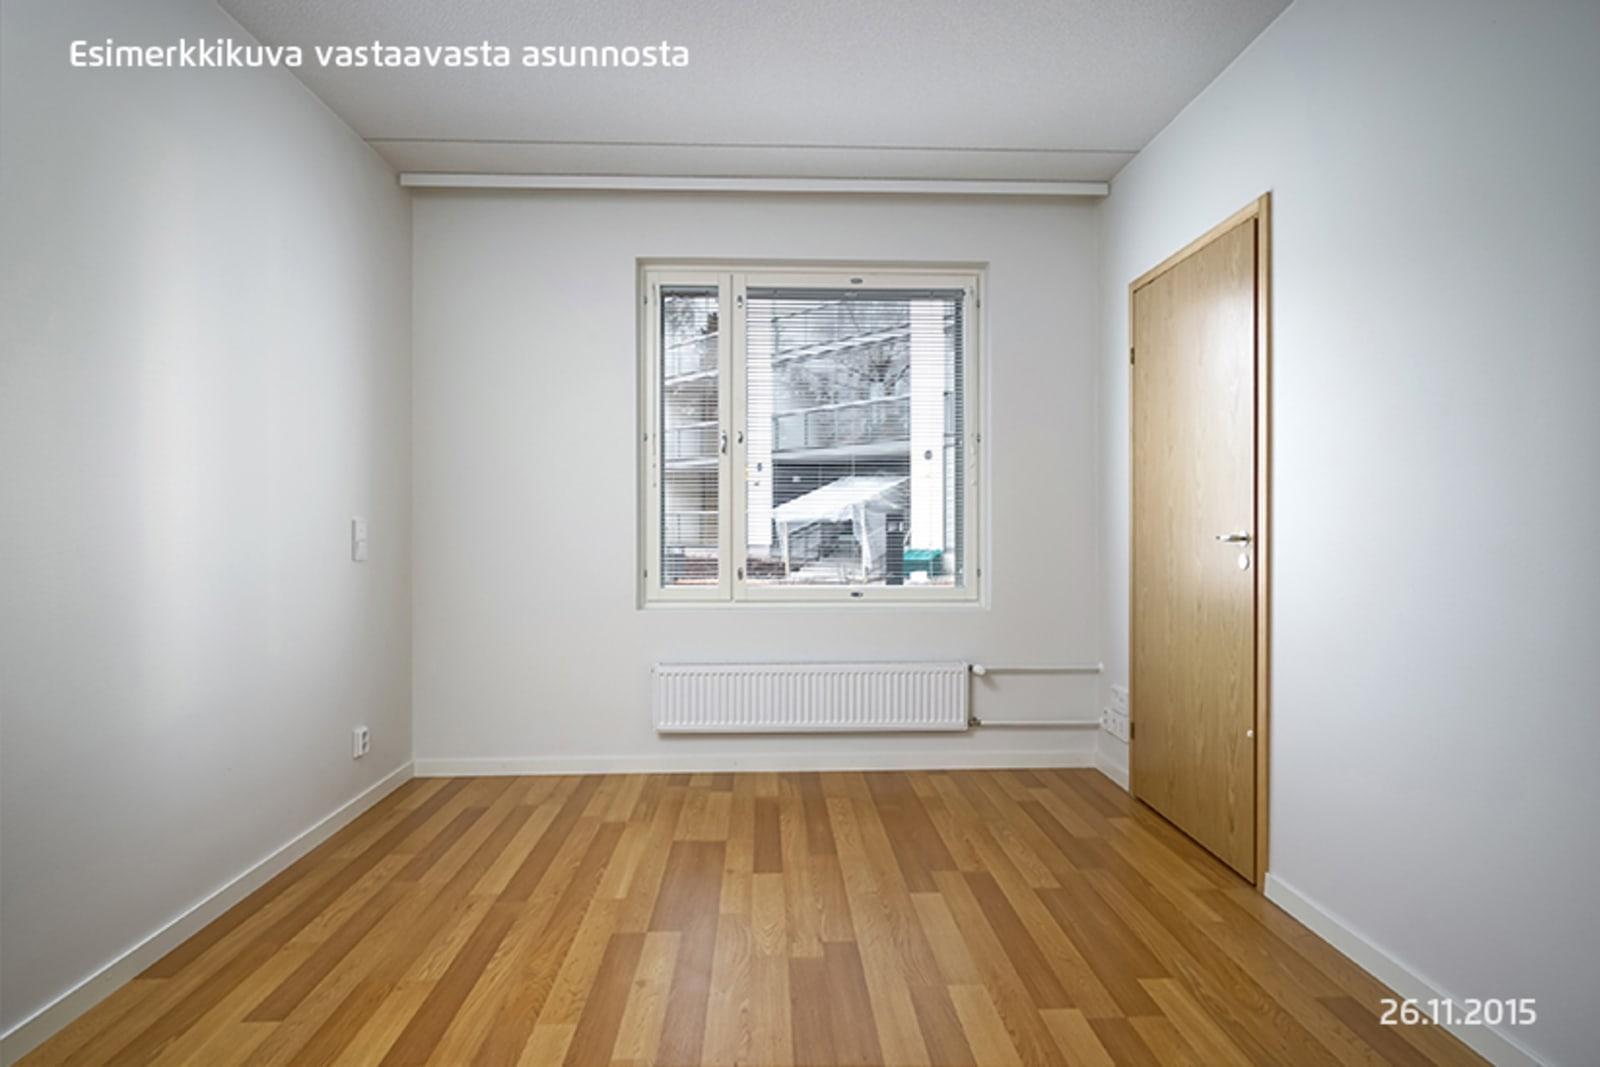 Espoo, Tapiola, Neulaspolku 2 B 009